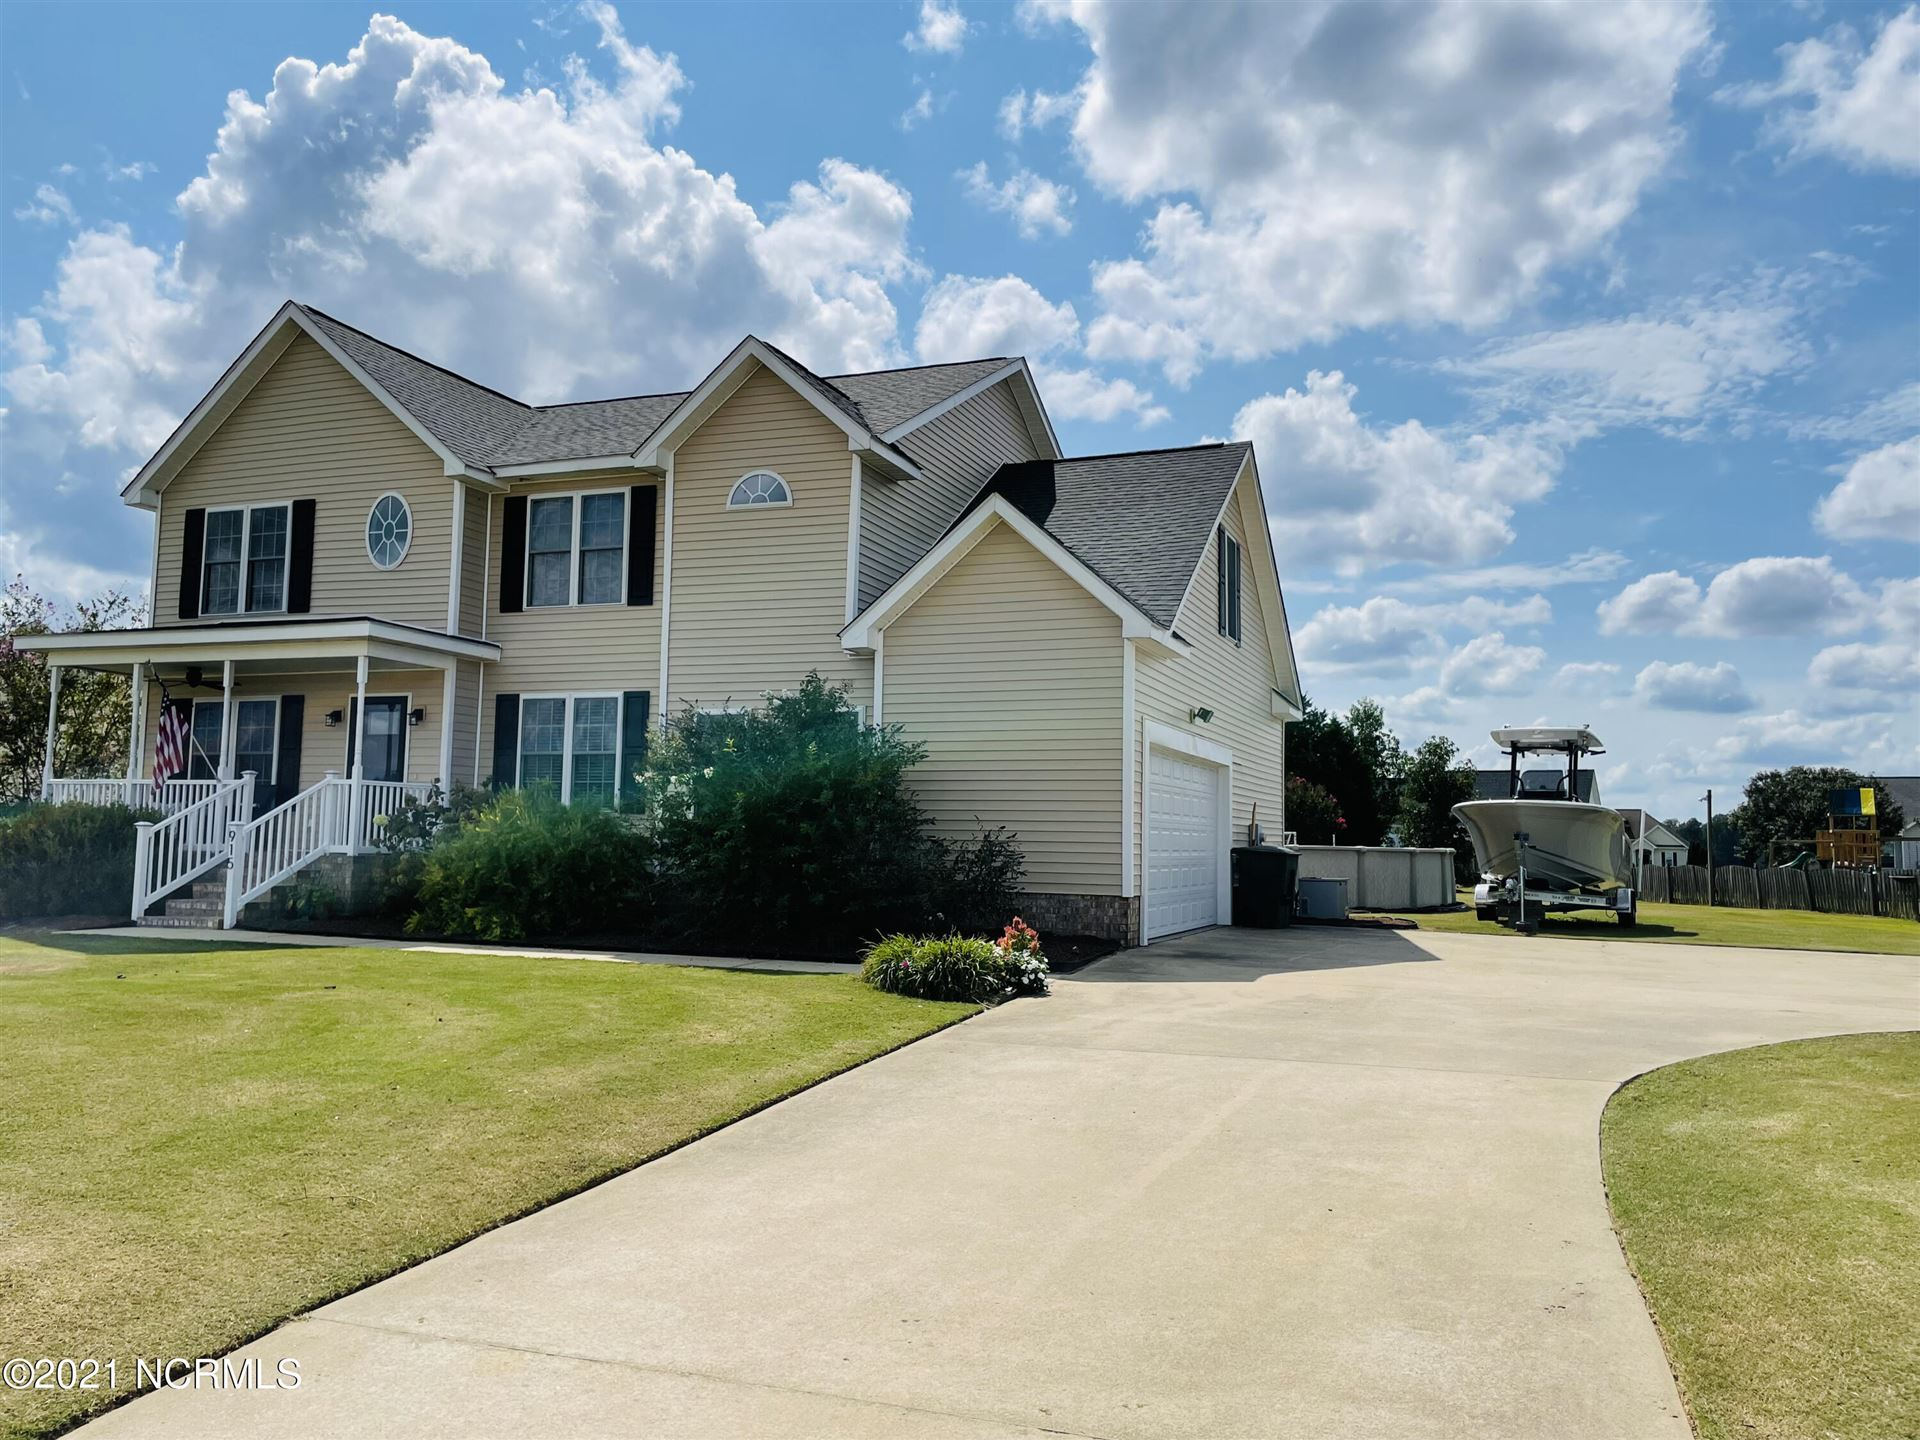 Photo of 915 Treyburn Circle, Greenville, NC 27858 (MLS # 100290886)